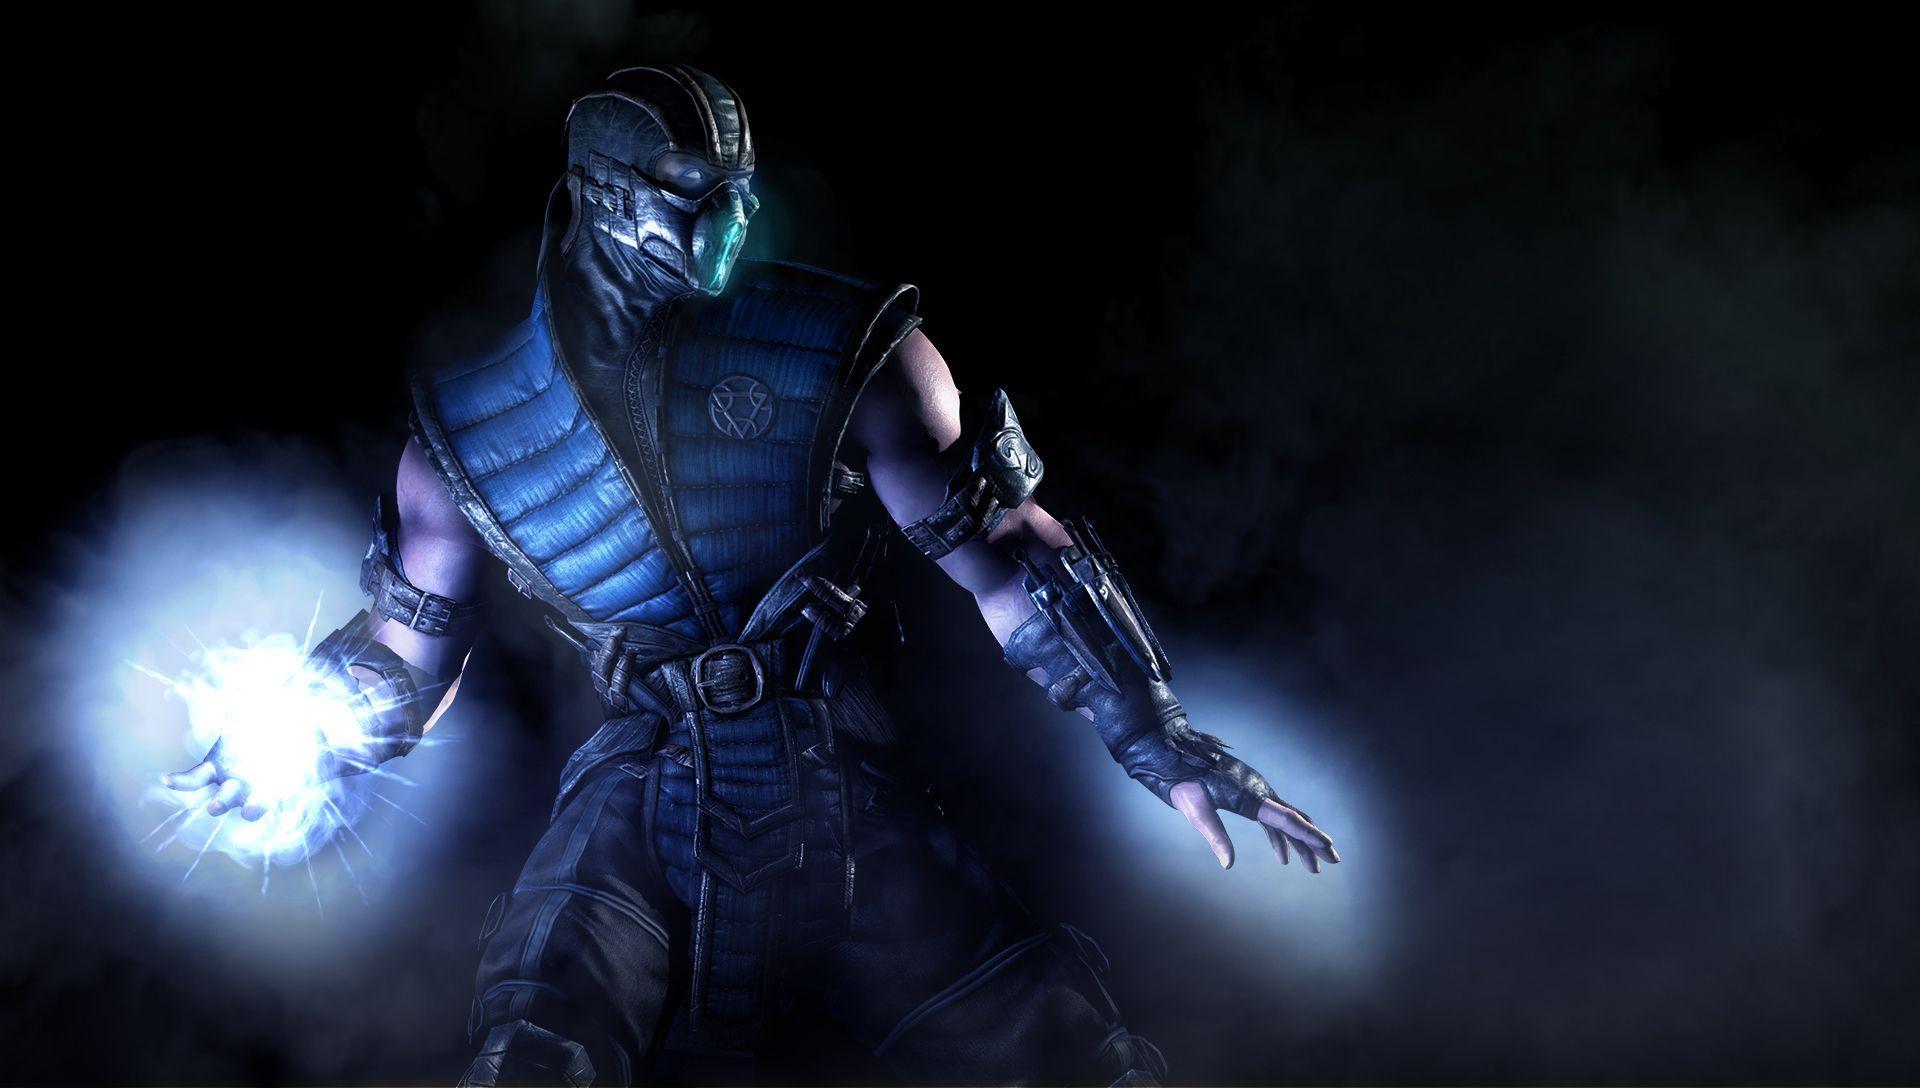 Mortal Kombat Sub Zero Wallpapers Top Free Mortal Kombat Sub